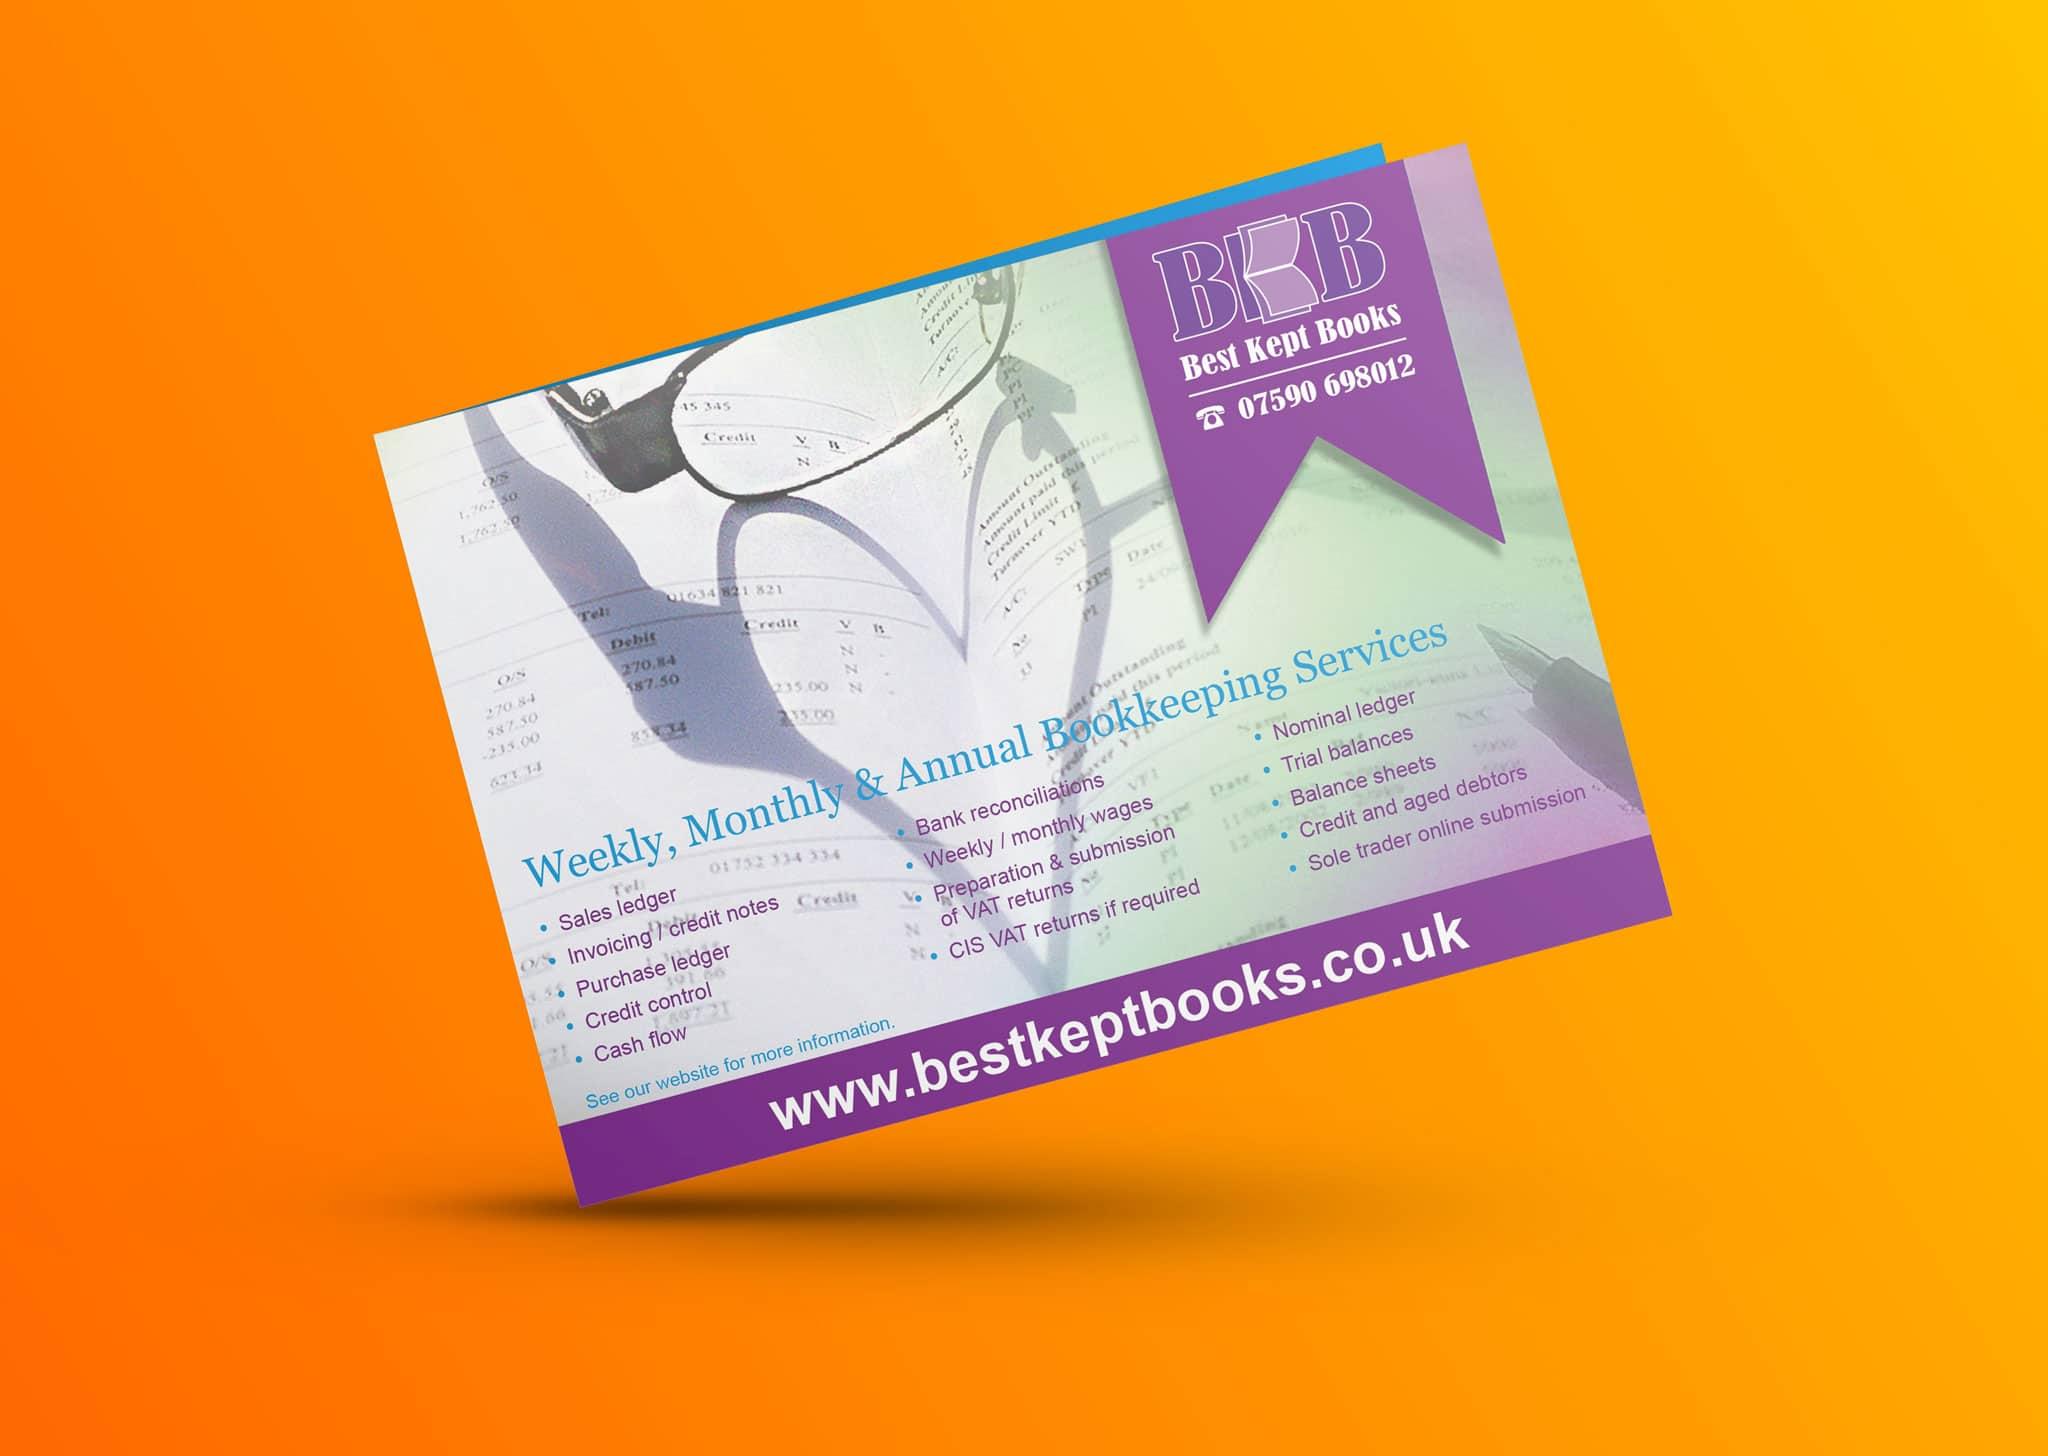 Business Start Up Corporate Branding Leaflet Design 2048 1456px